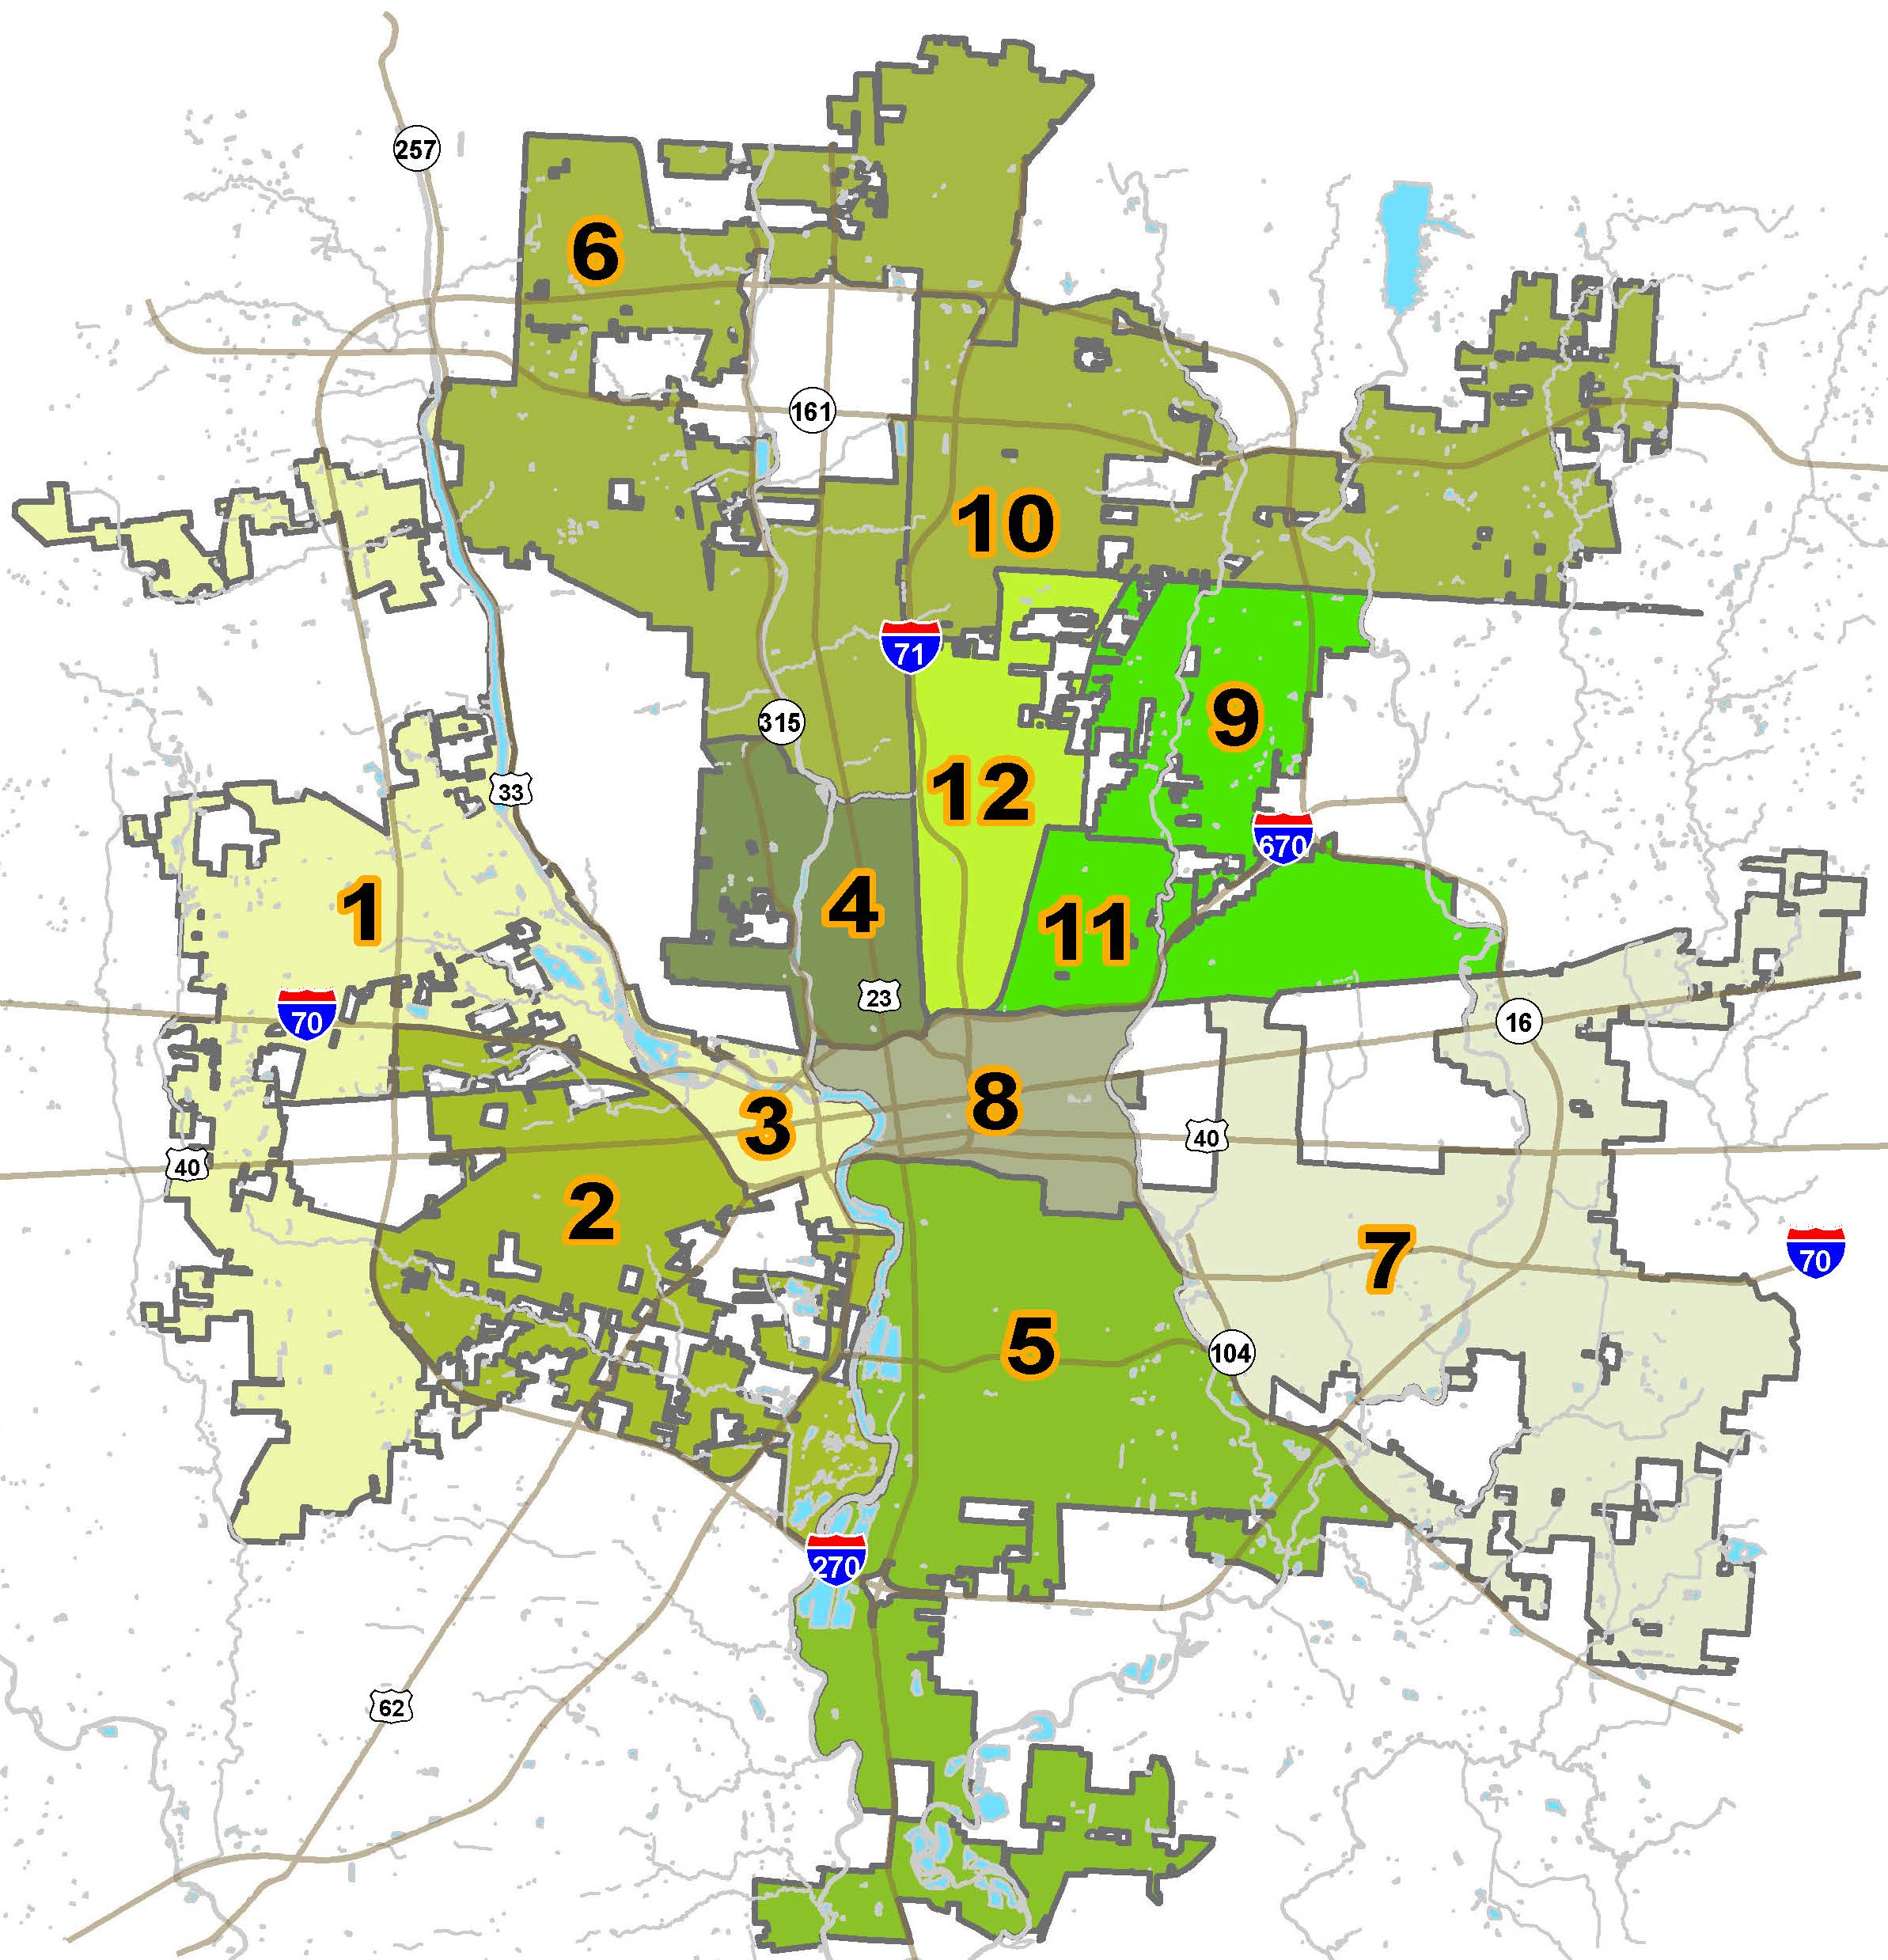 Code Enforcement Areas